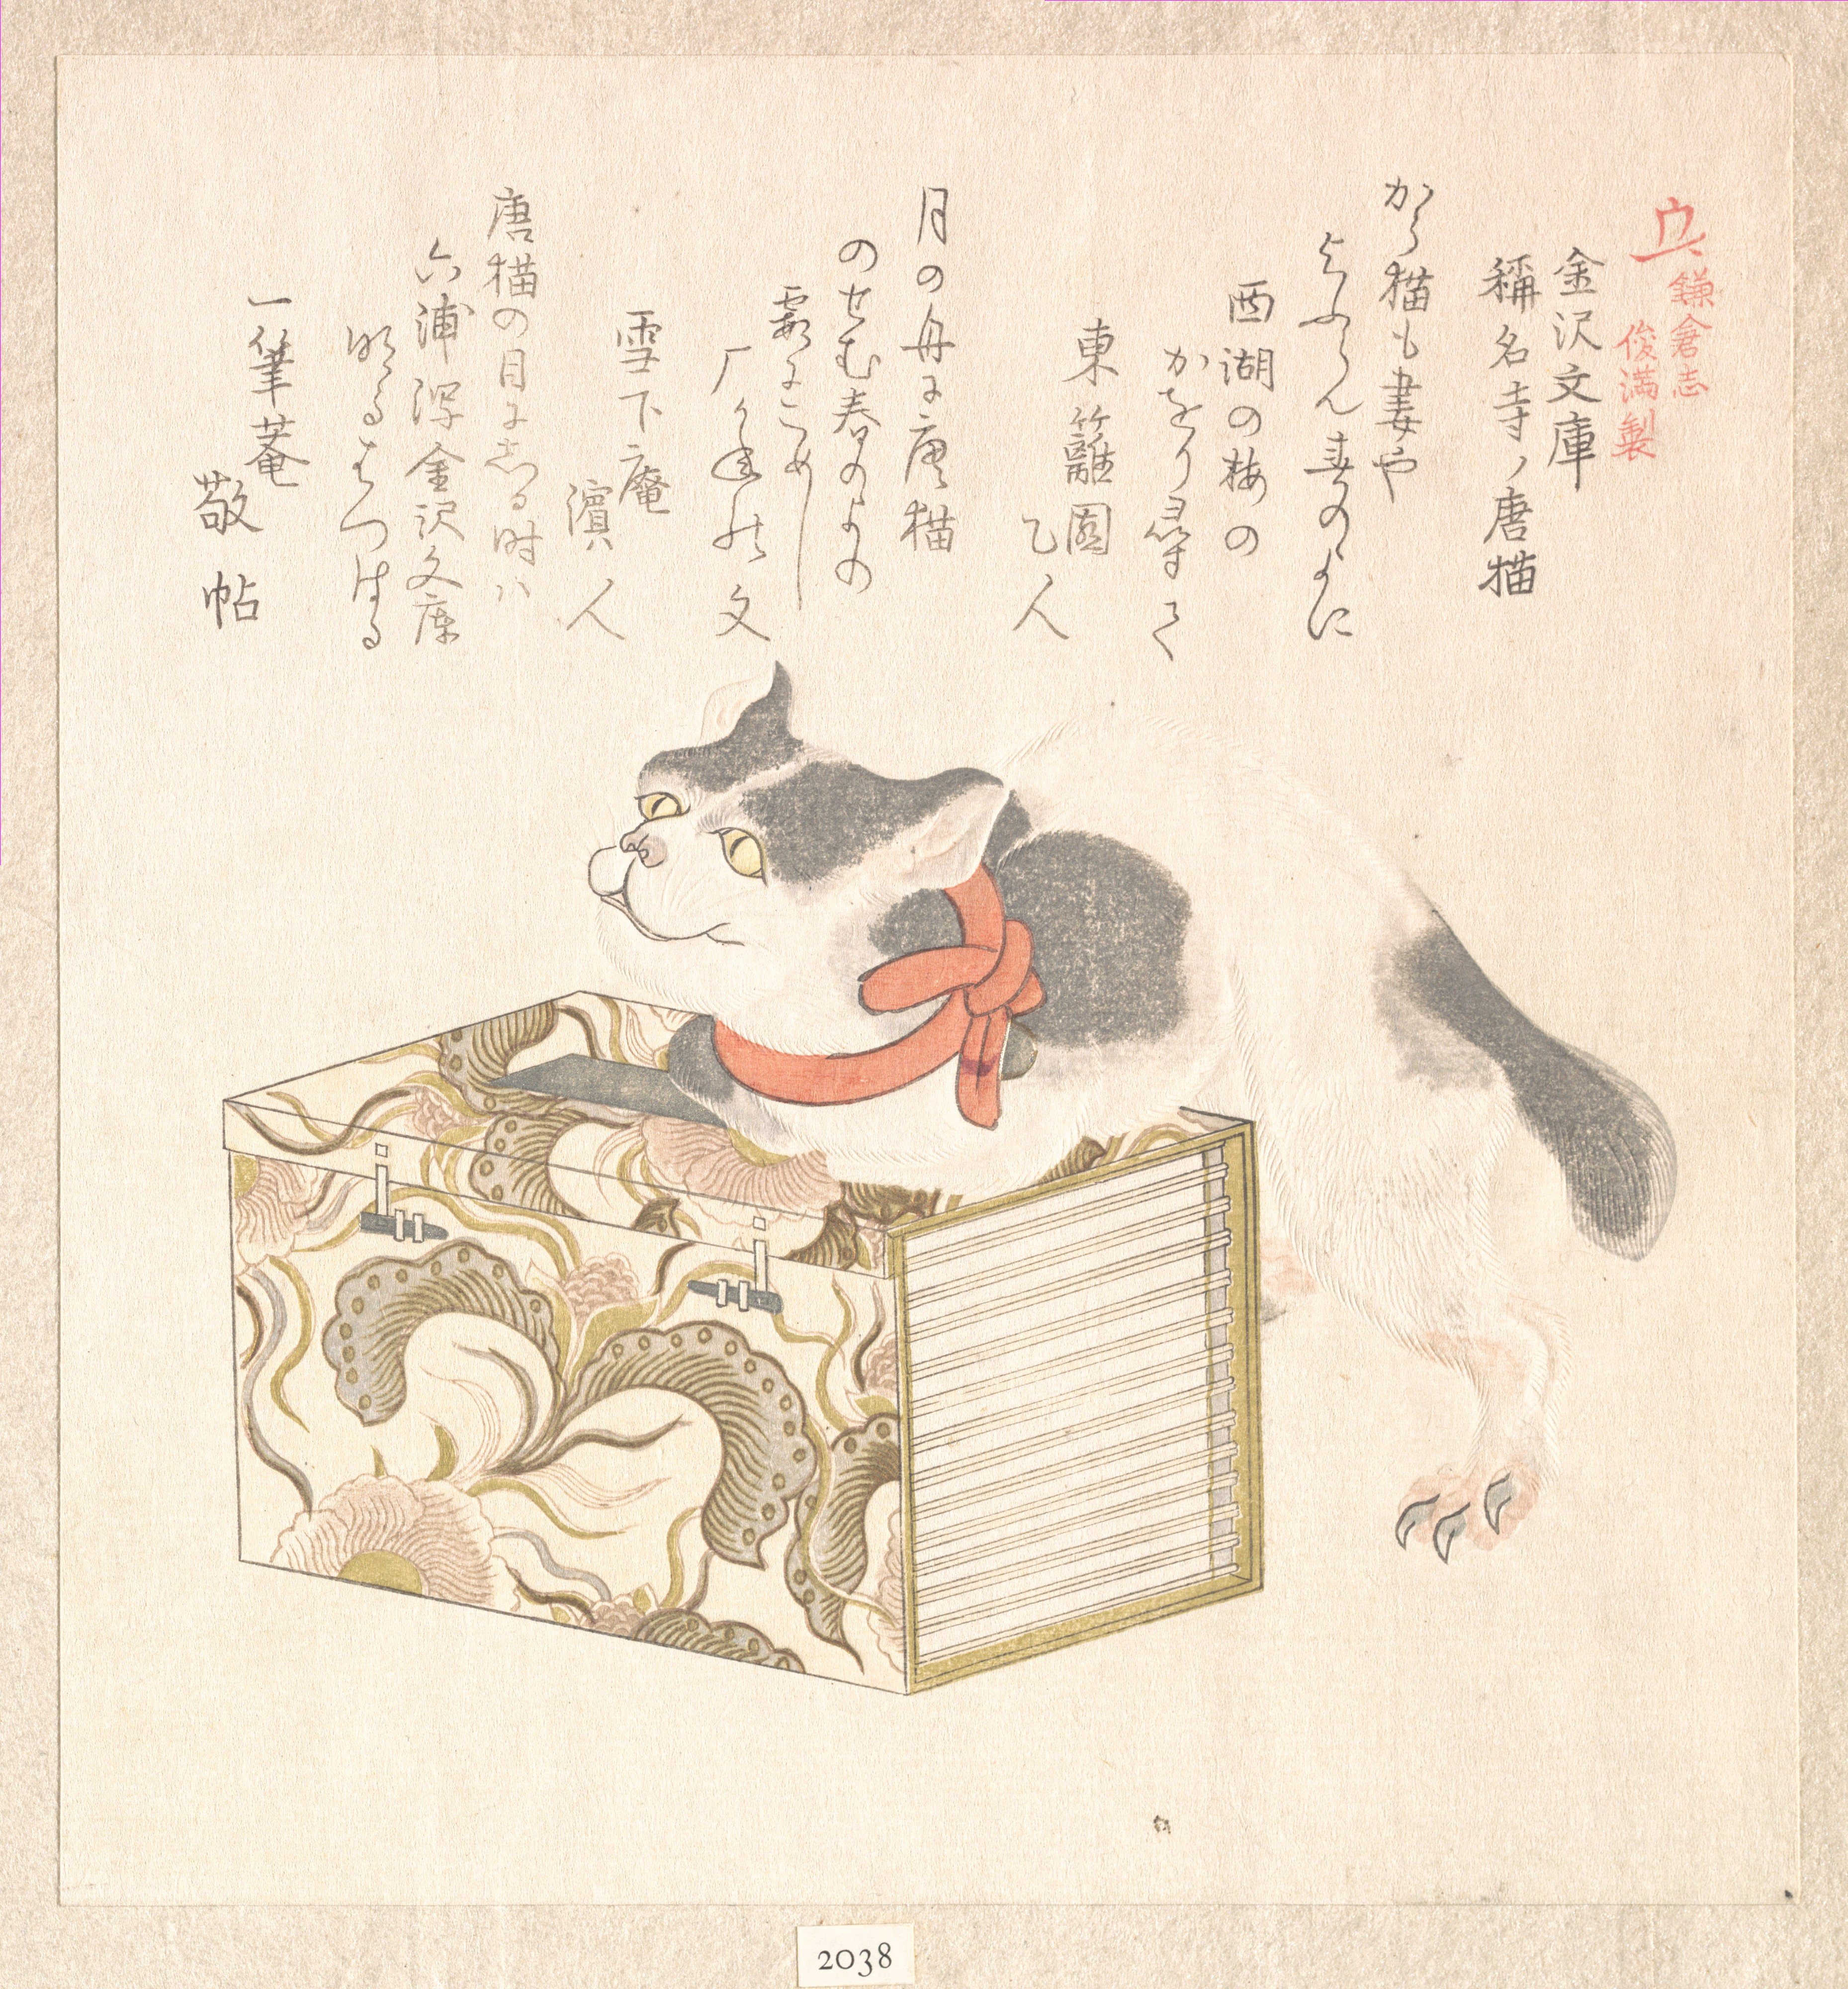 История Камакура_1810-е_195х183 мм